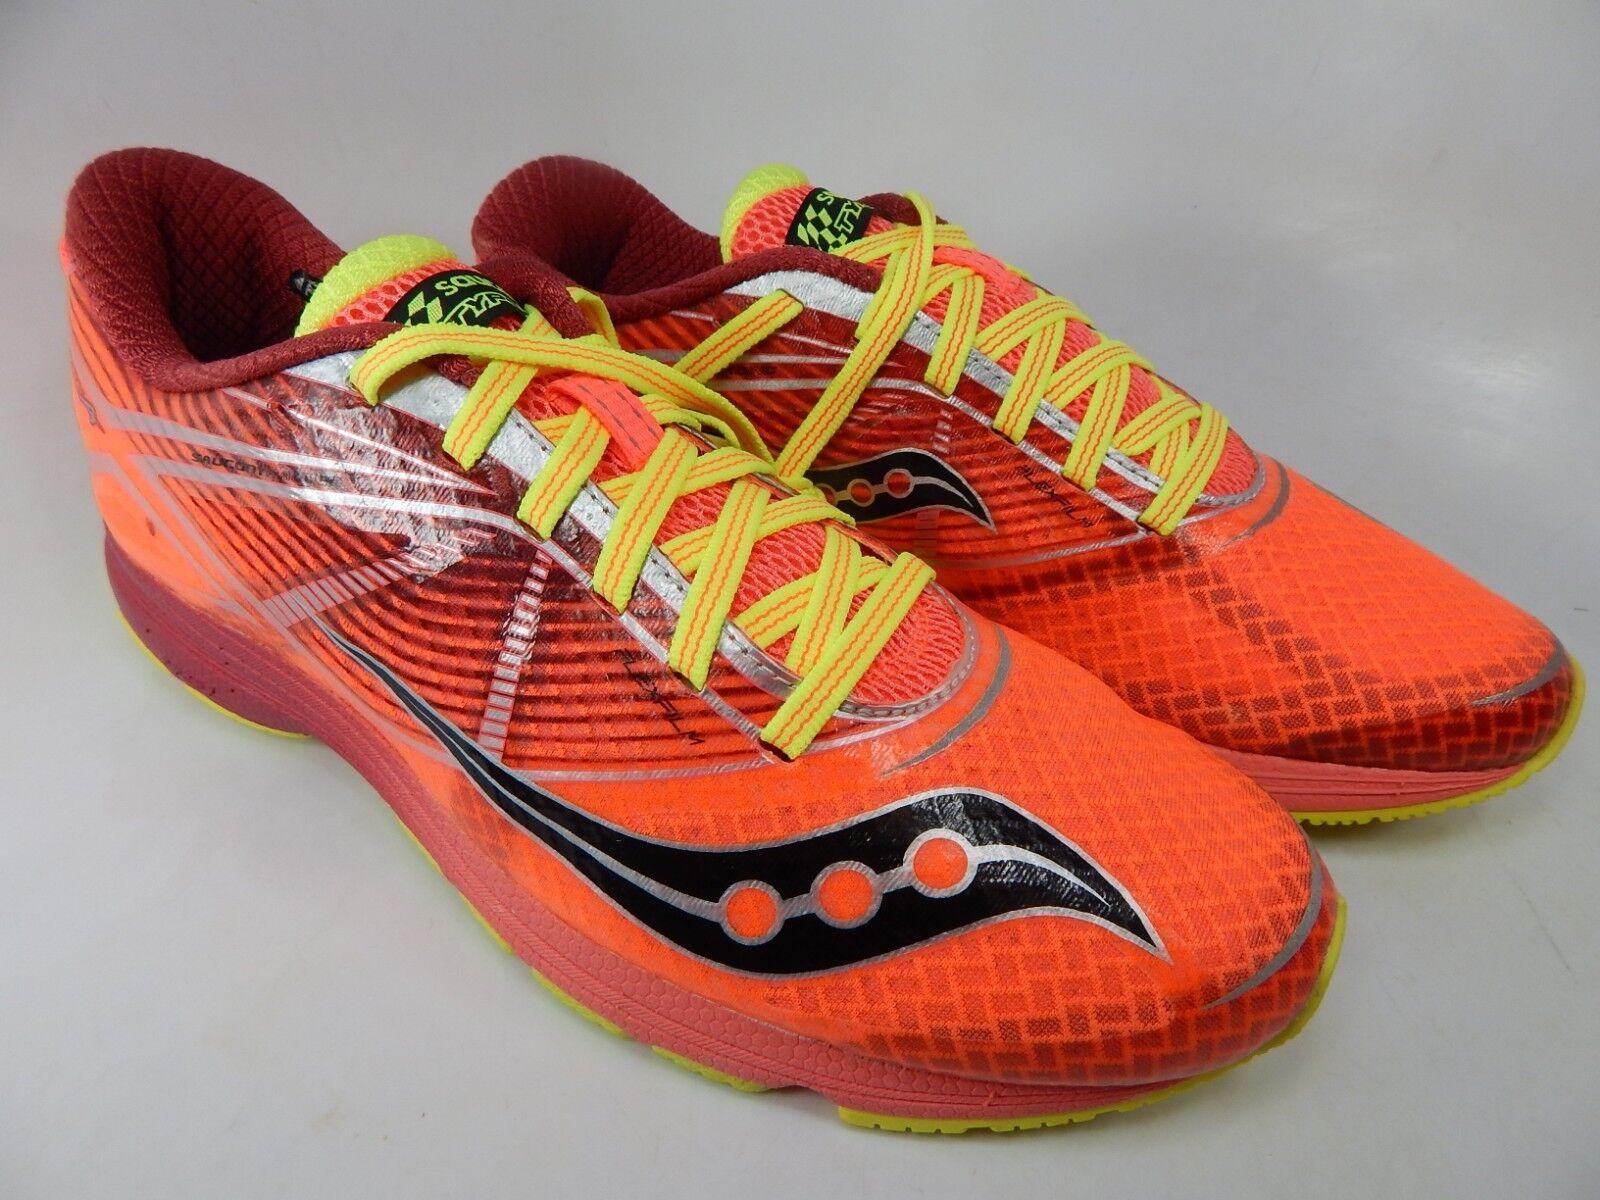 Saucony Type A7 Dimensione 8 M (B) EU 39 Wouomo Running scarpe Coral Citron S19028-1